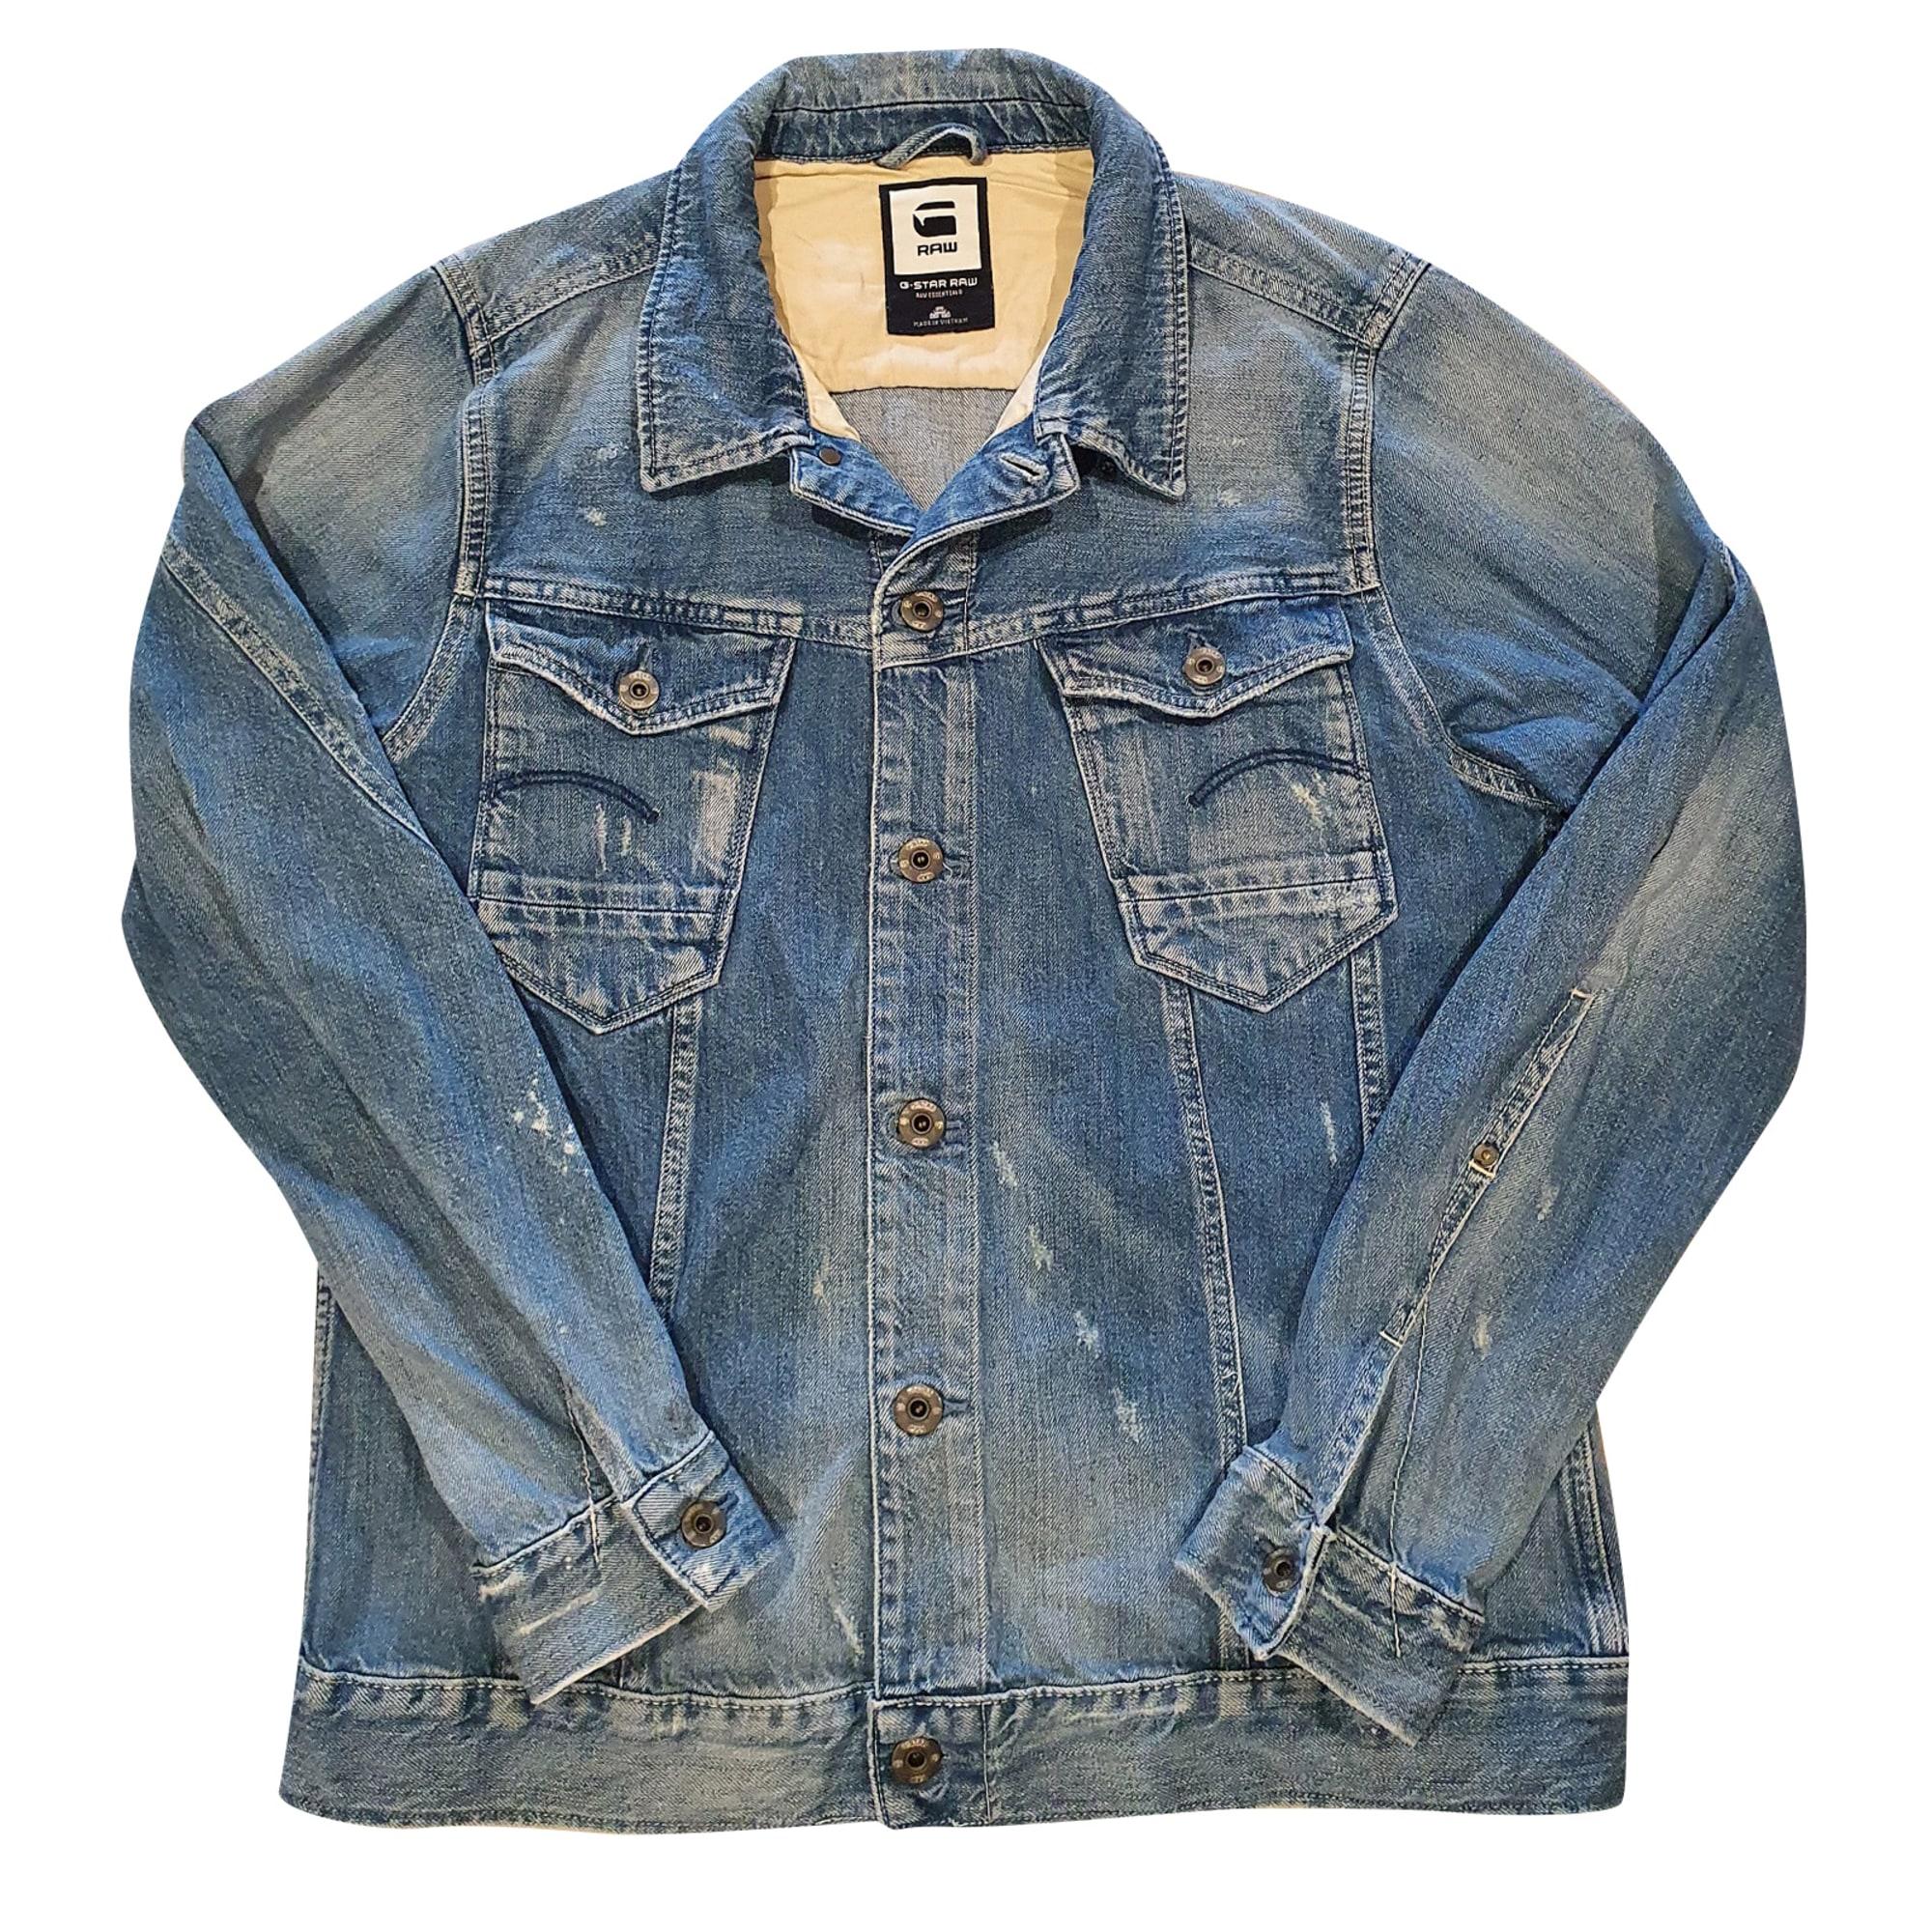 Denim Zipped Jacket G-STAR Blue, navy, turquoise